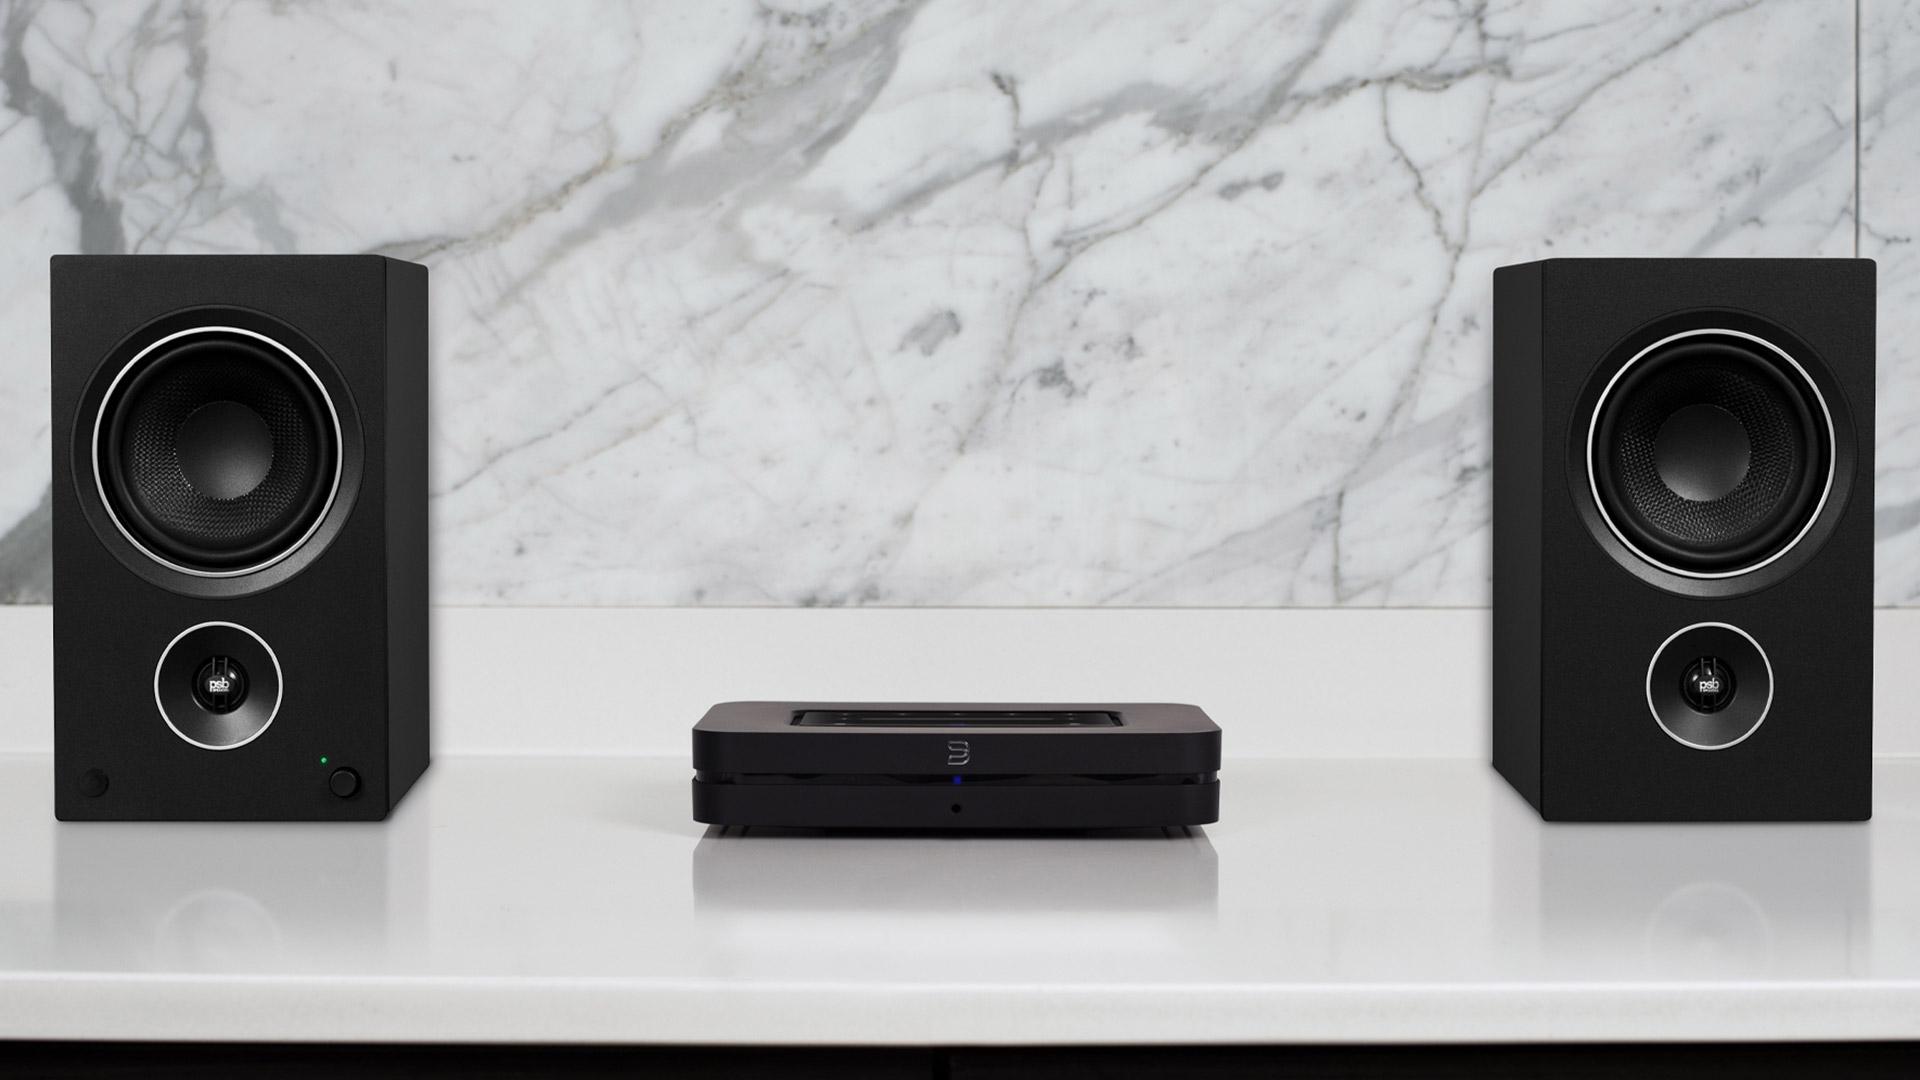 Streaming wireless speakers, soundbars and streamers